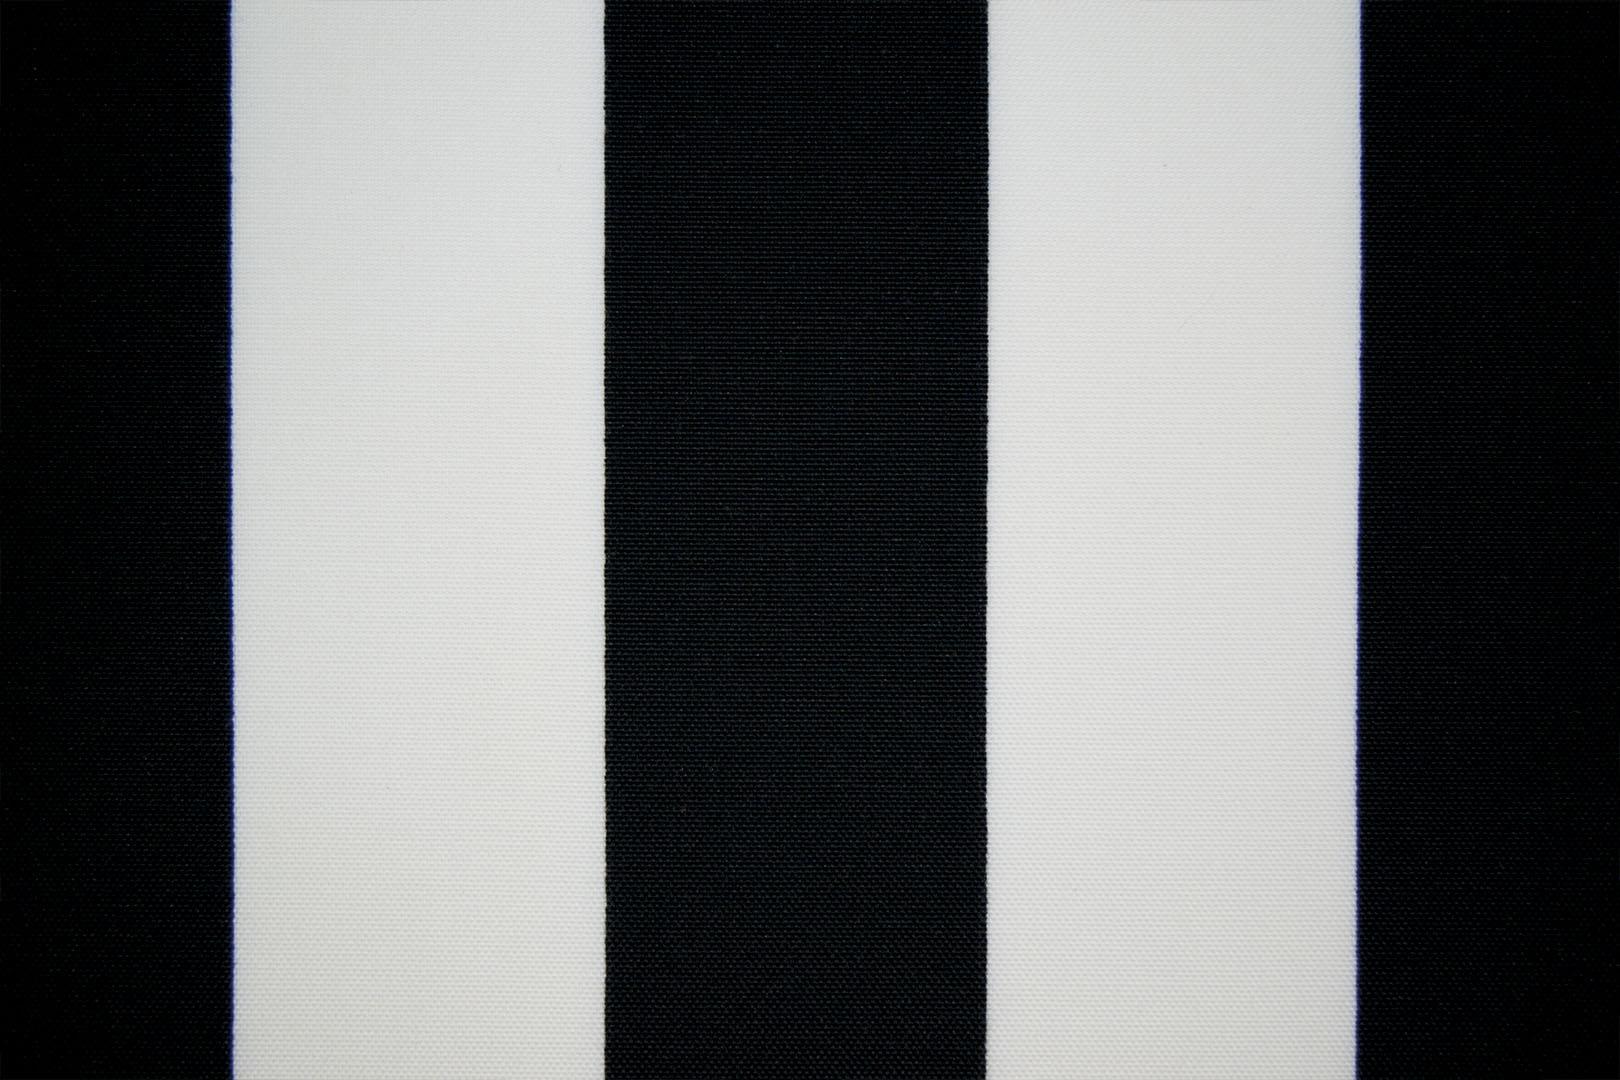 205_43042_blackWhite